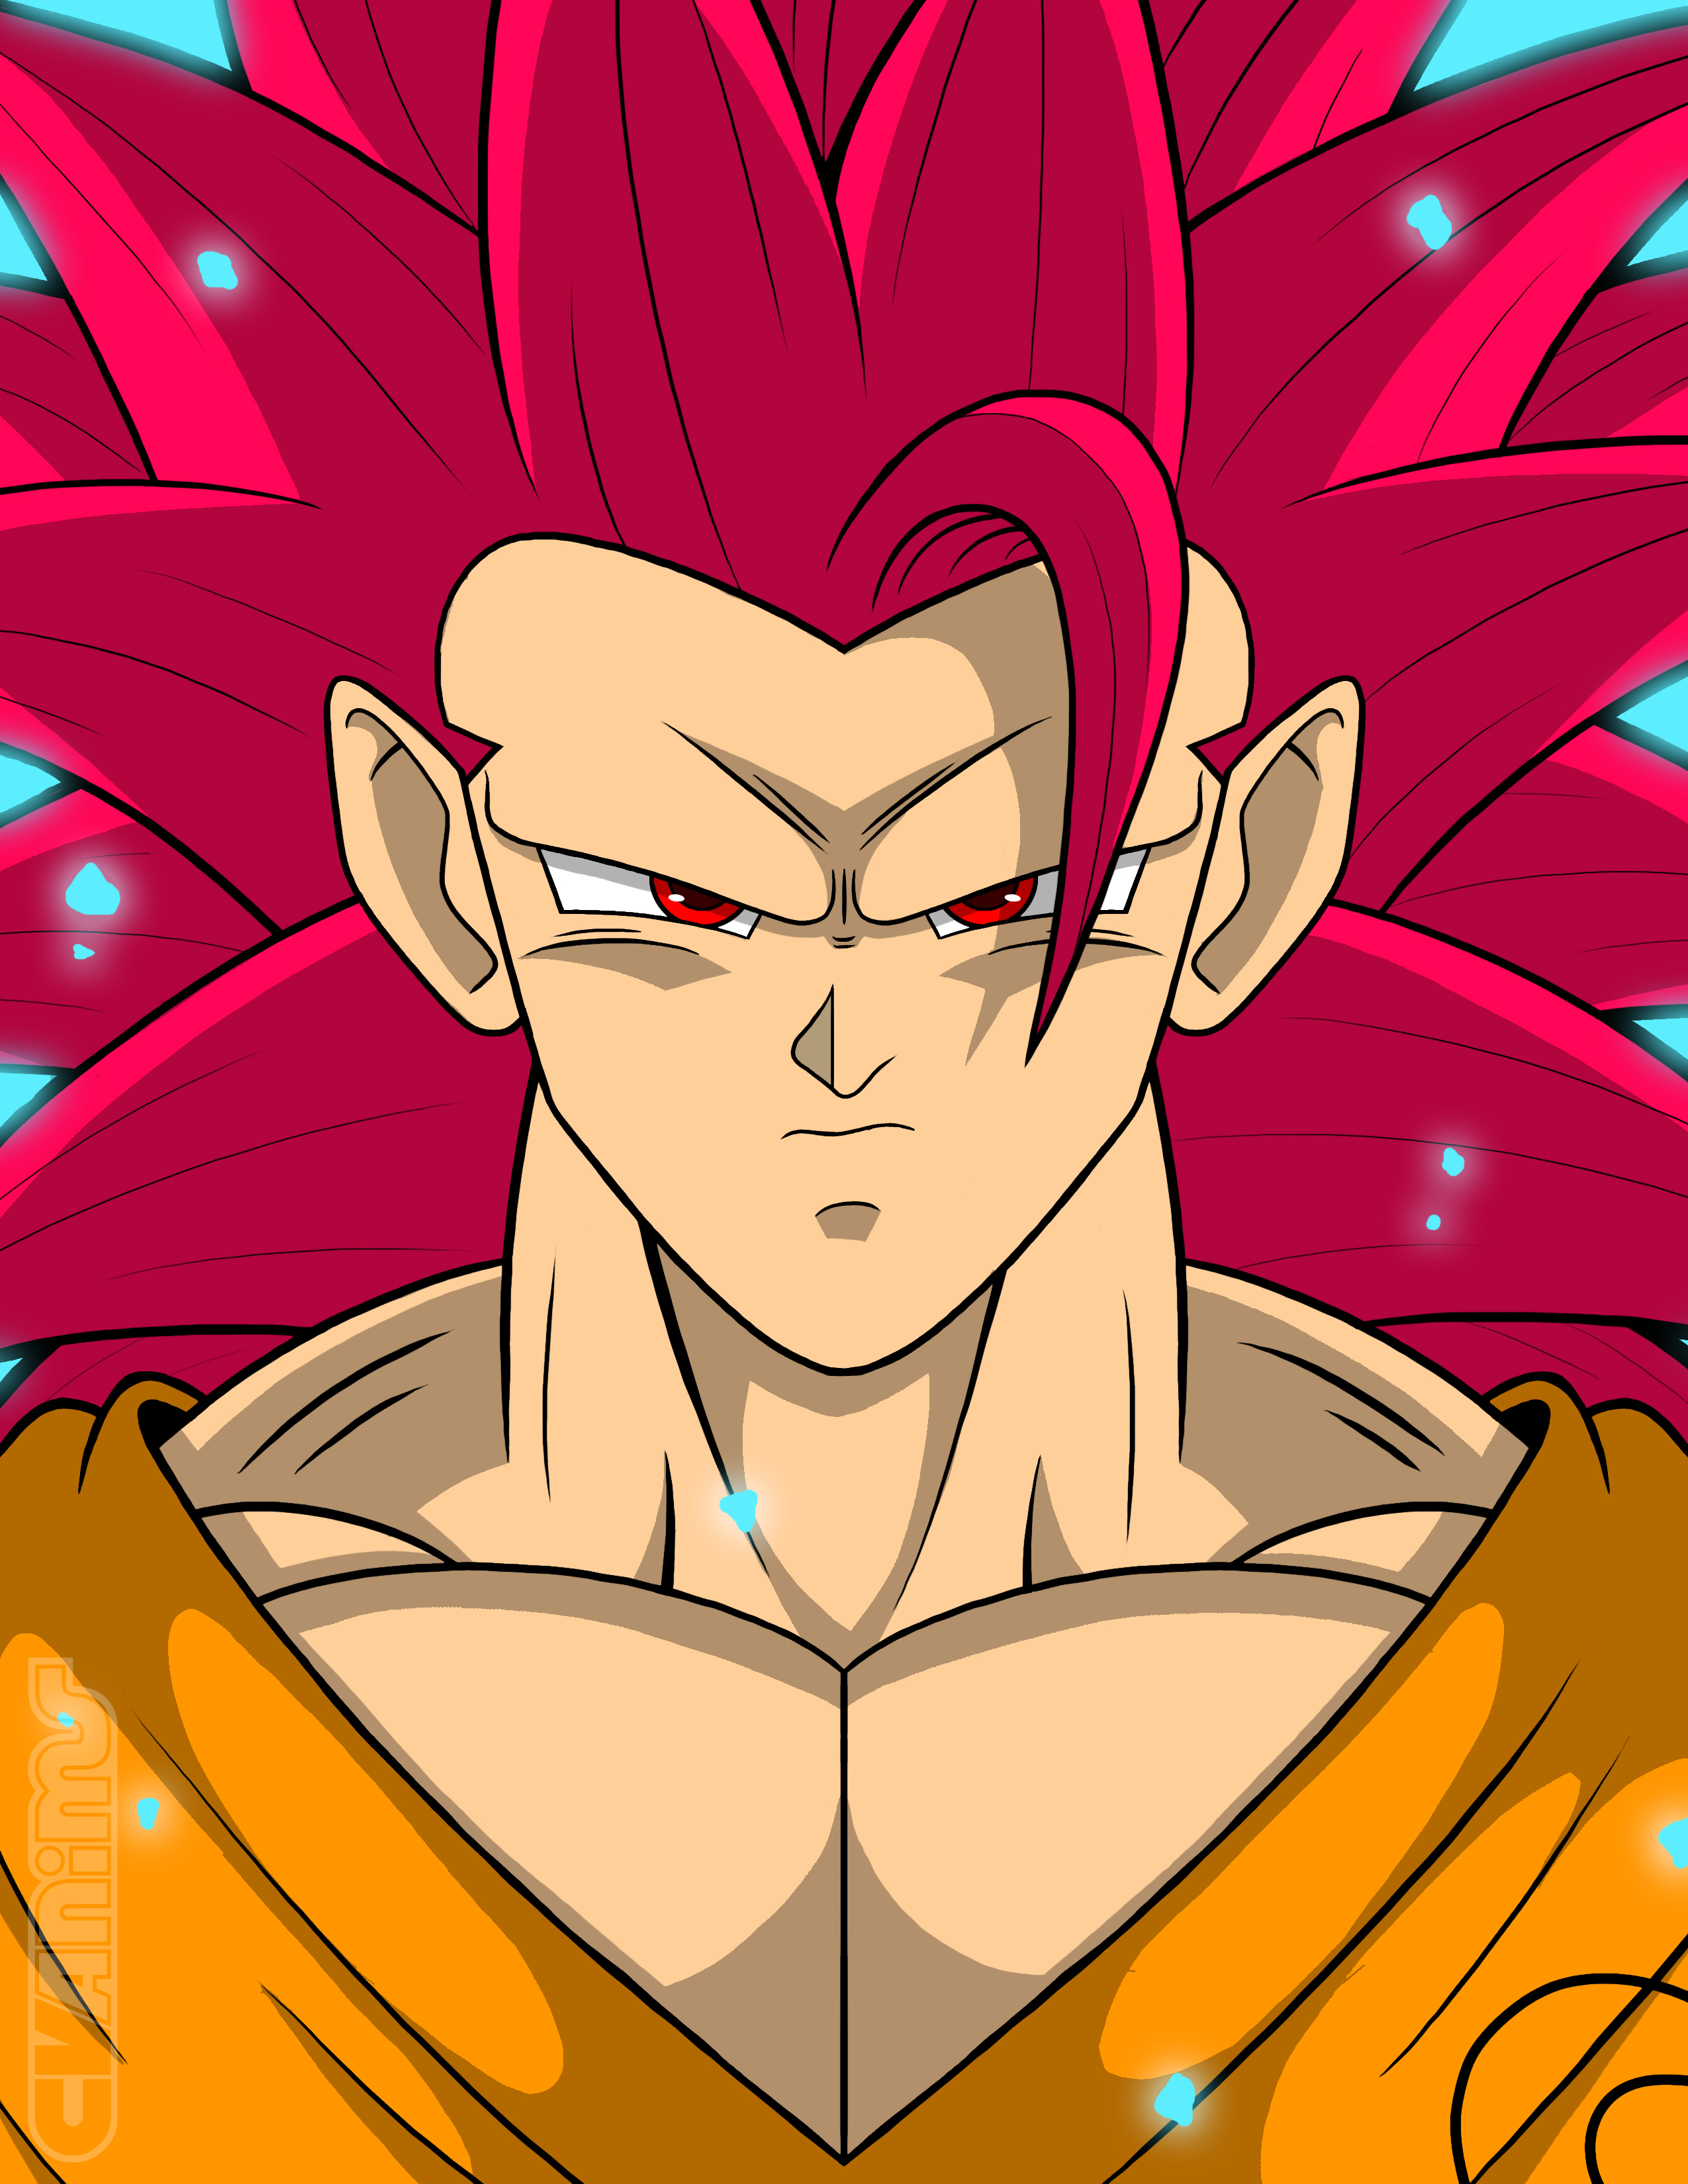 Super Saiyan God 3?!